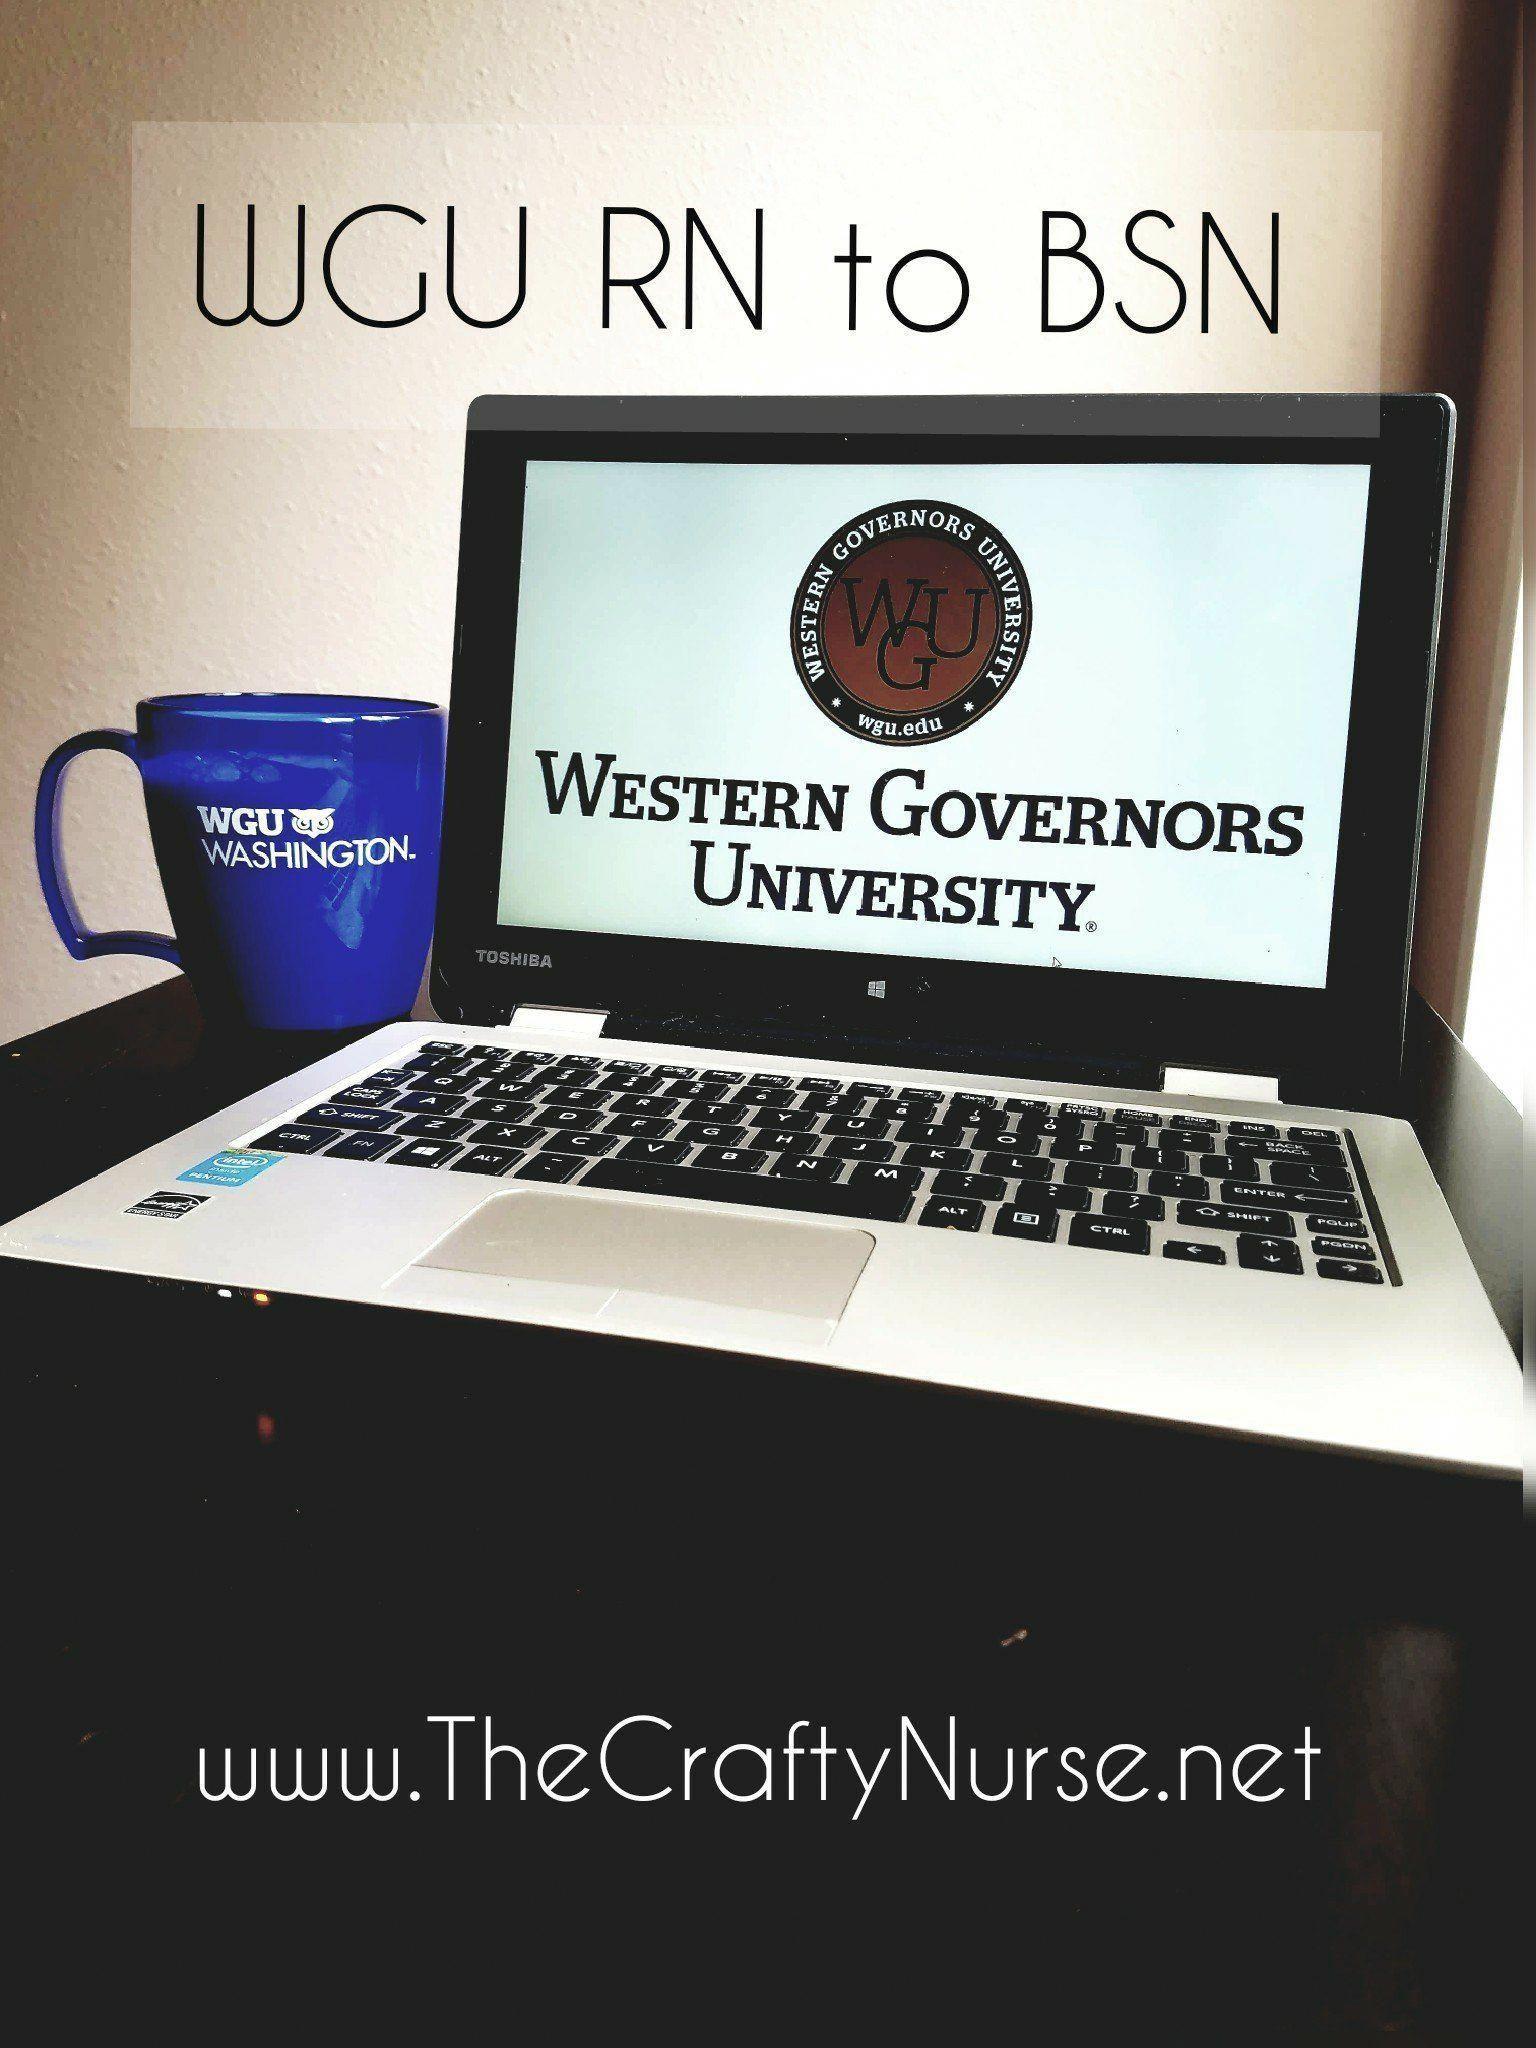 Per diem nursing jobs nursepractitionerschooling with